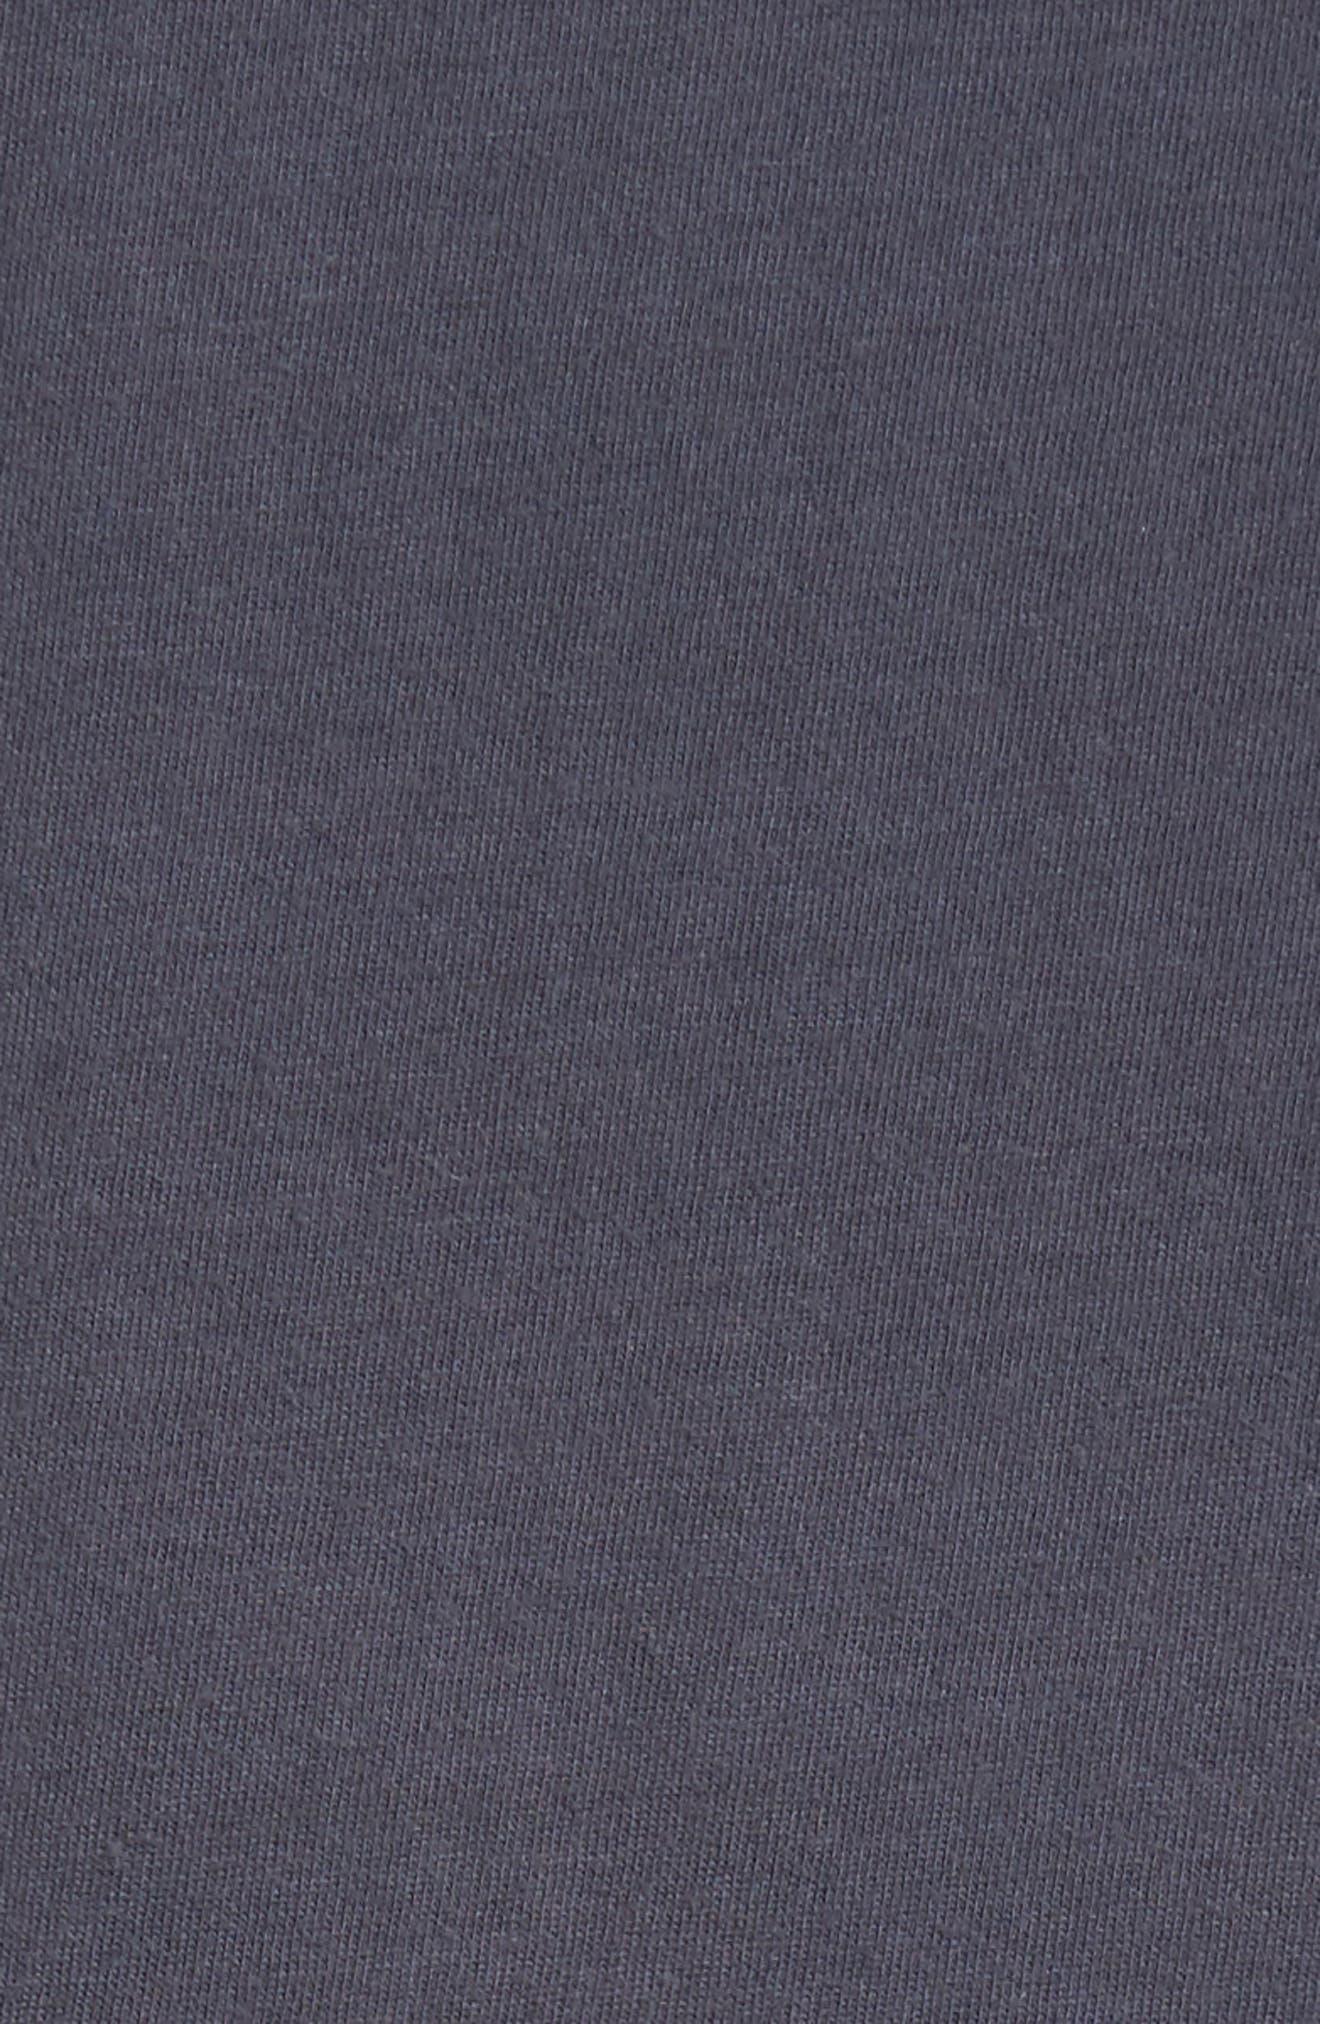 Eastwood - Chicago Cubs V-Neck T-Shirt,                             Alternate thumbnail 5, color,                             410